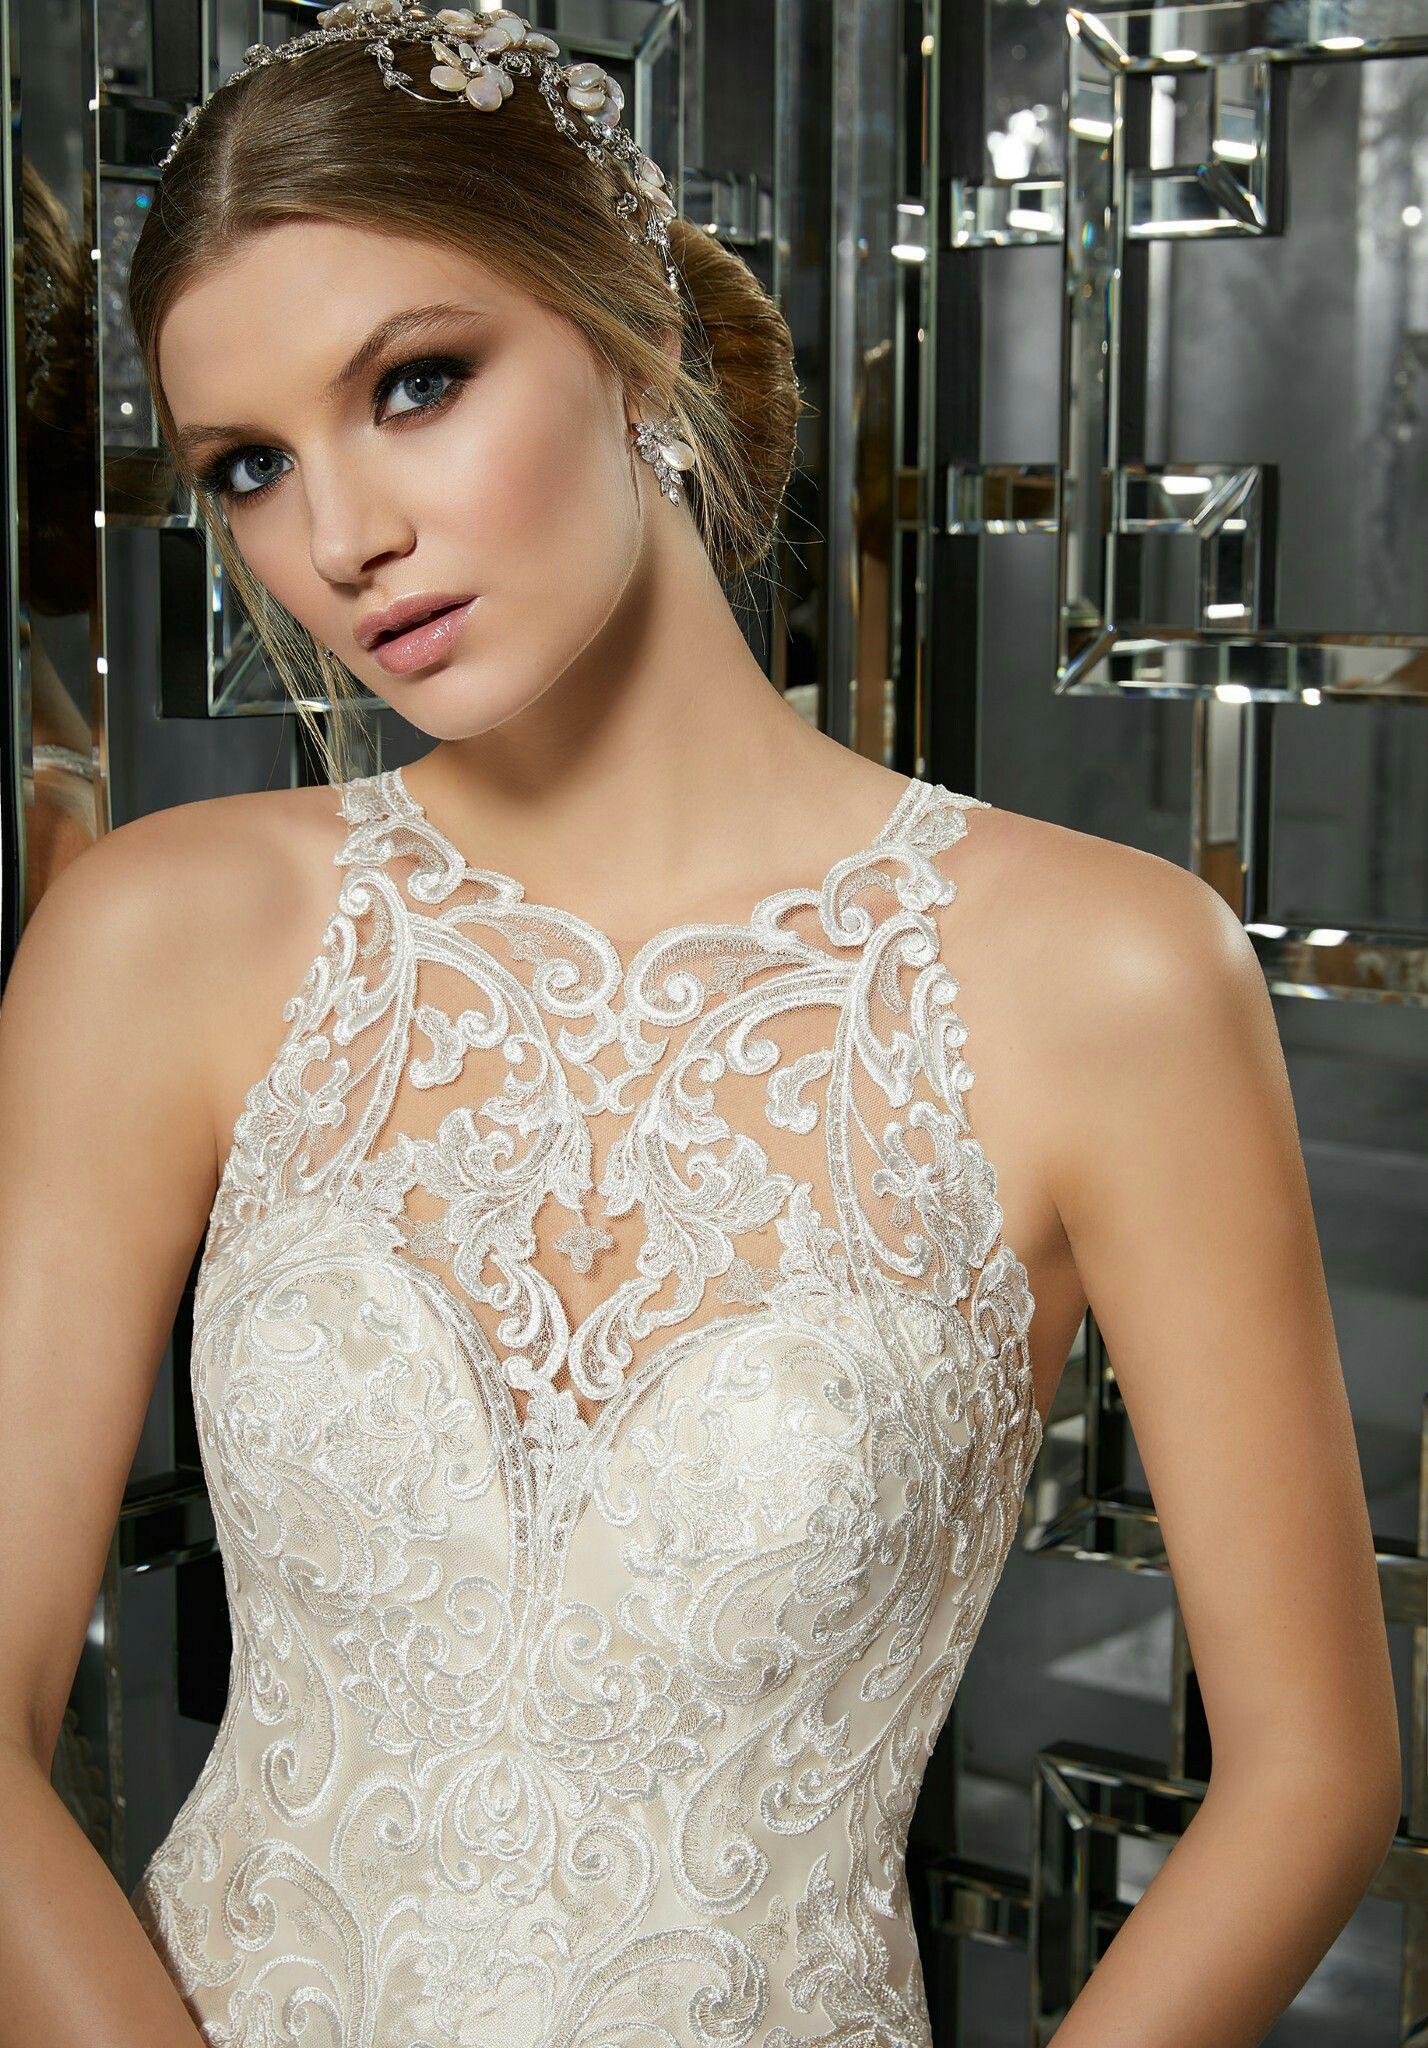 Pin by simone rabelo on noivas pinterest trumpets wedding dress